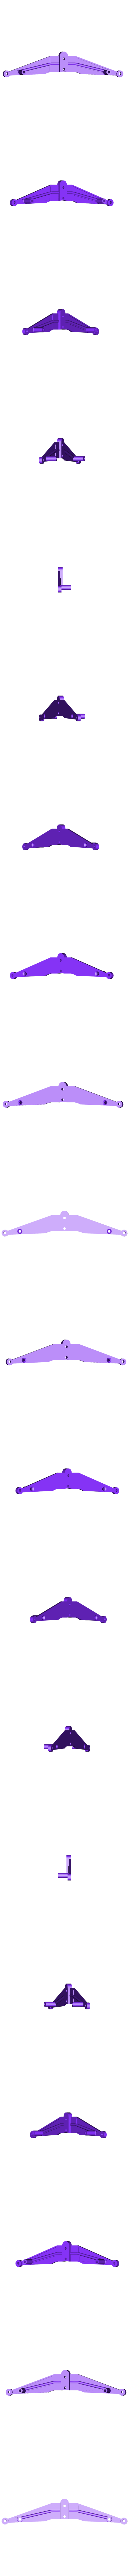 lower suspension arms.stl Download free STL file 1991 Mazda 787B 3d Printed RC Car • 3D printable template, brett